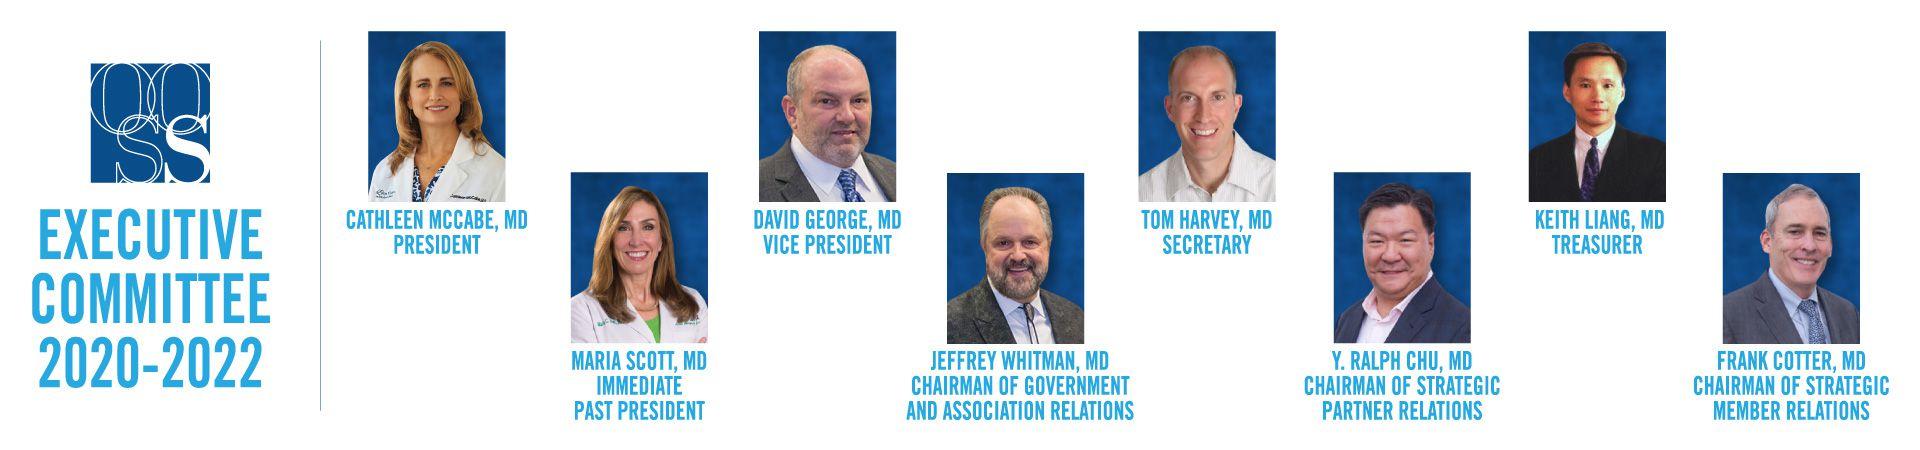 OOSS - Executive Committee